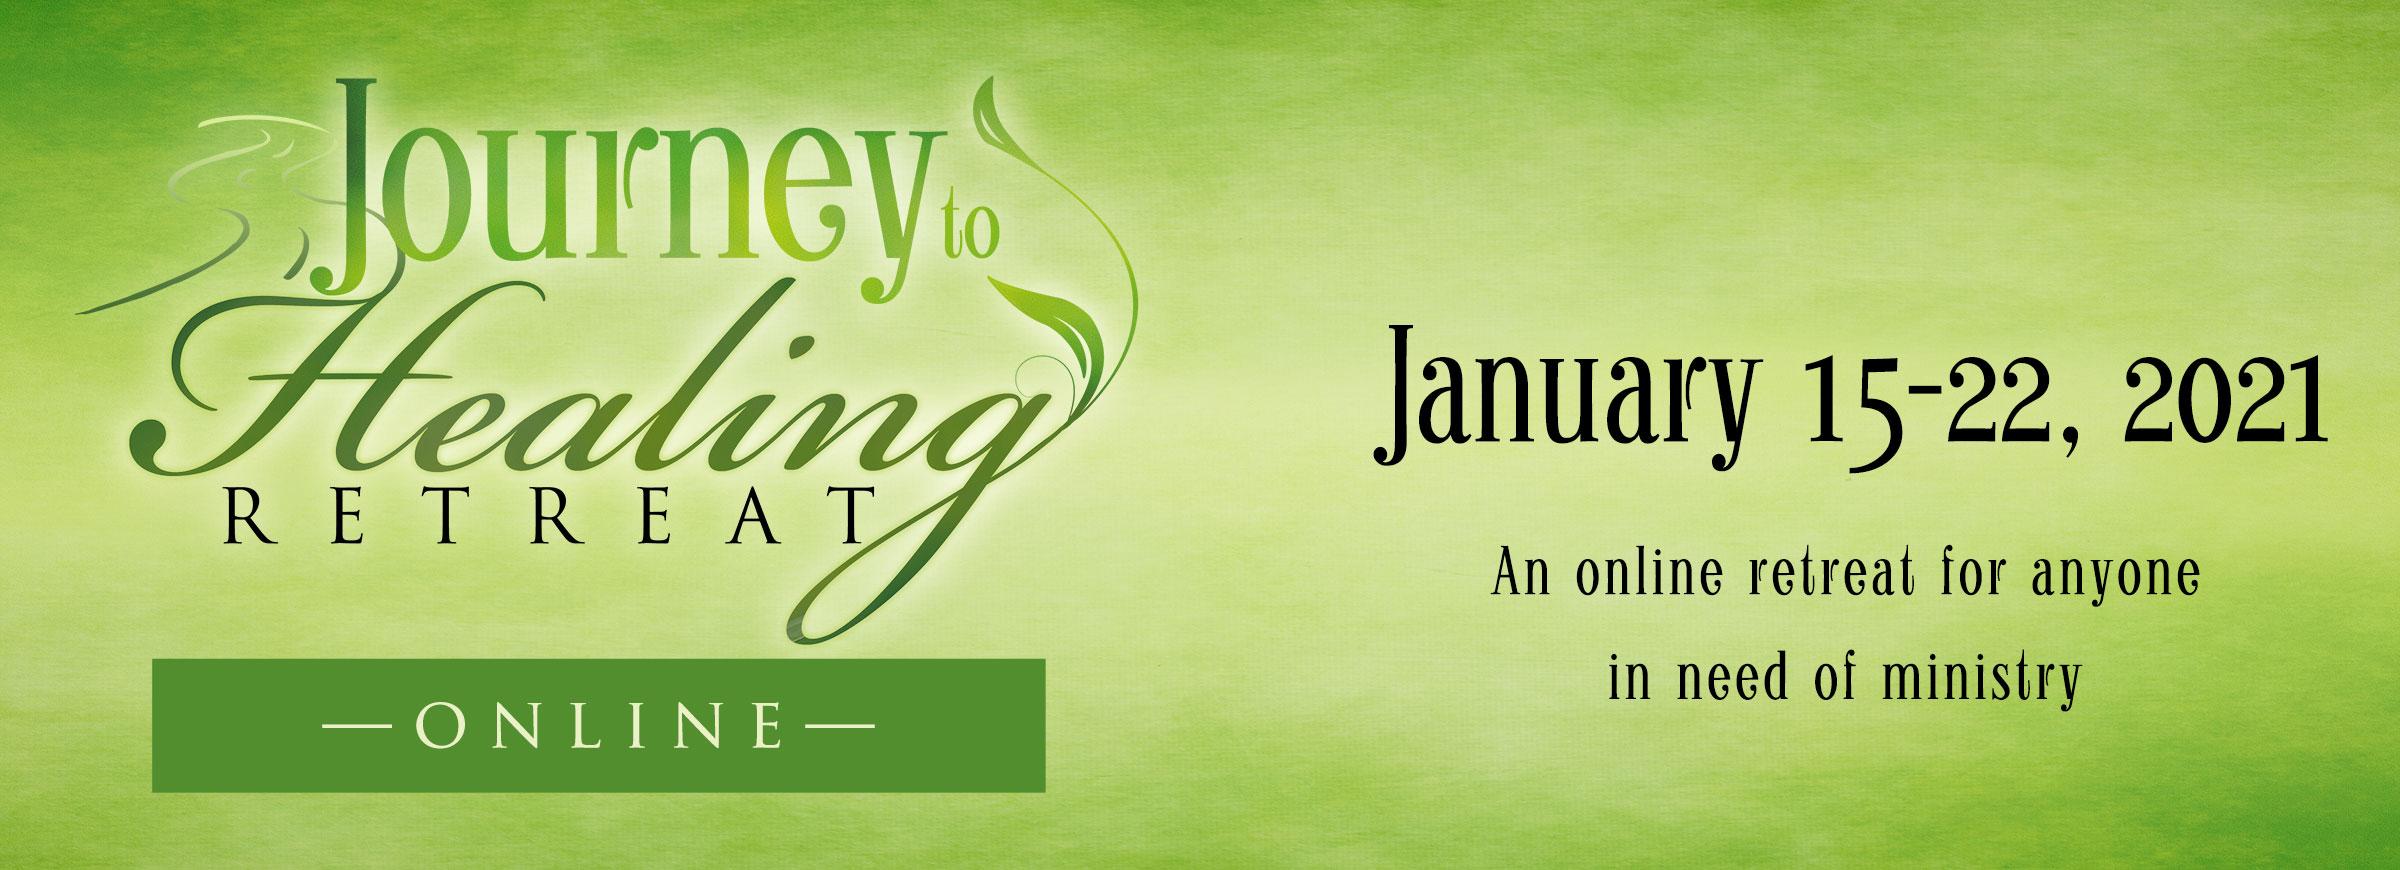 Journey to Healing Retreat Online January 2021